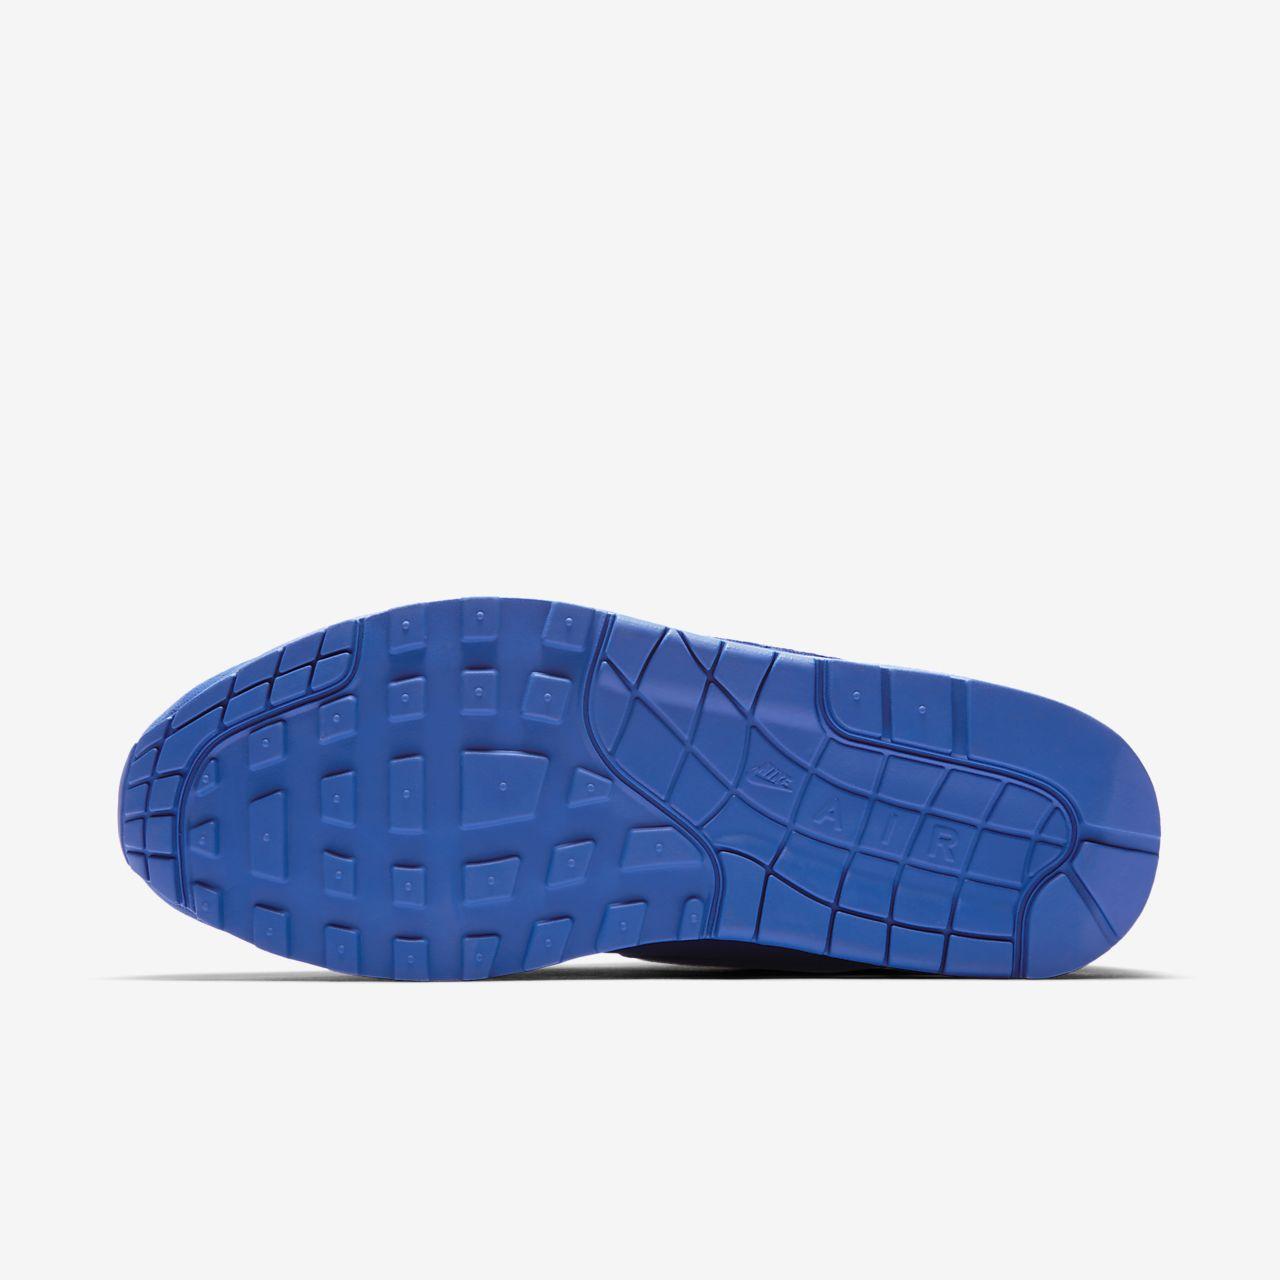 Nike Air Max 1 Premium sko til mænd